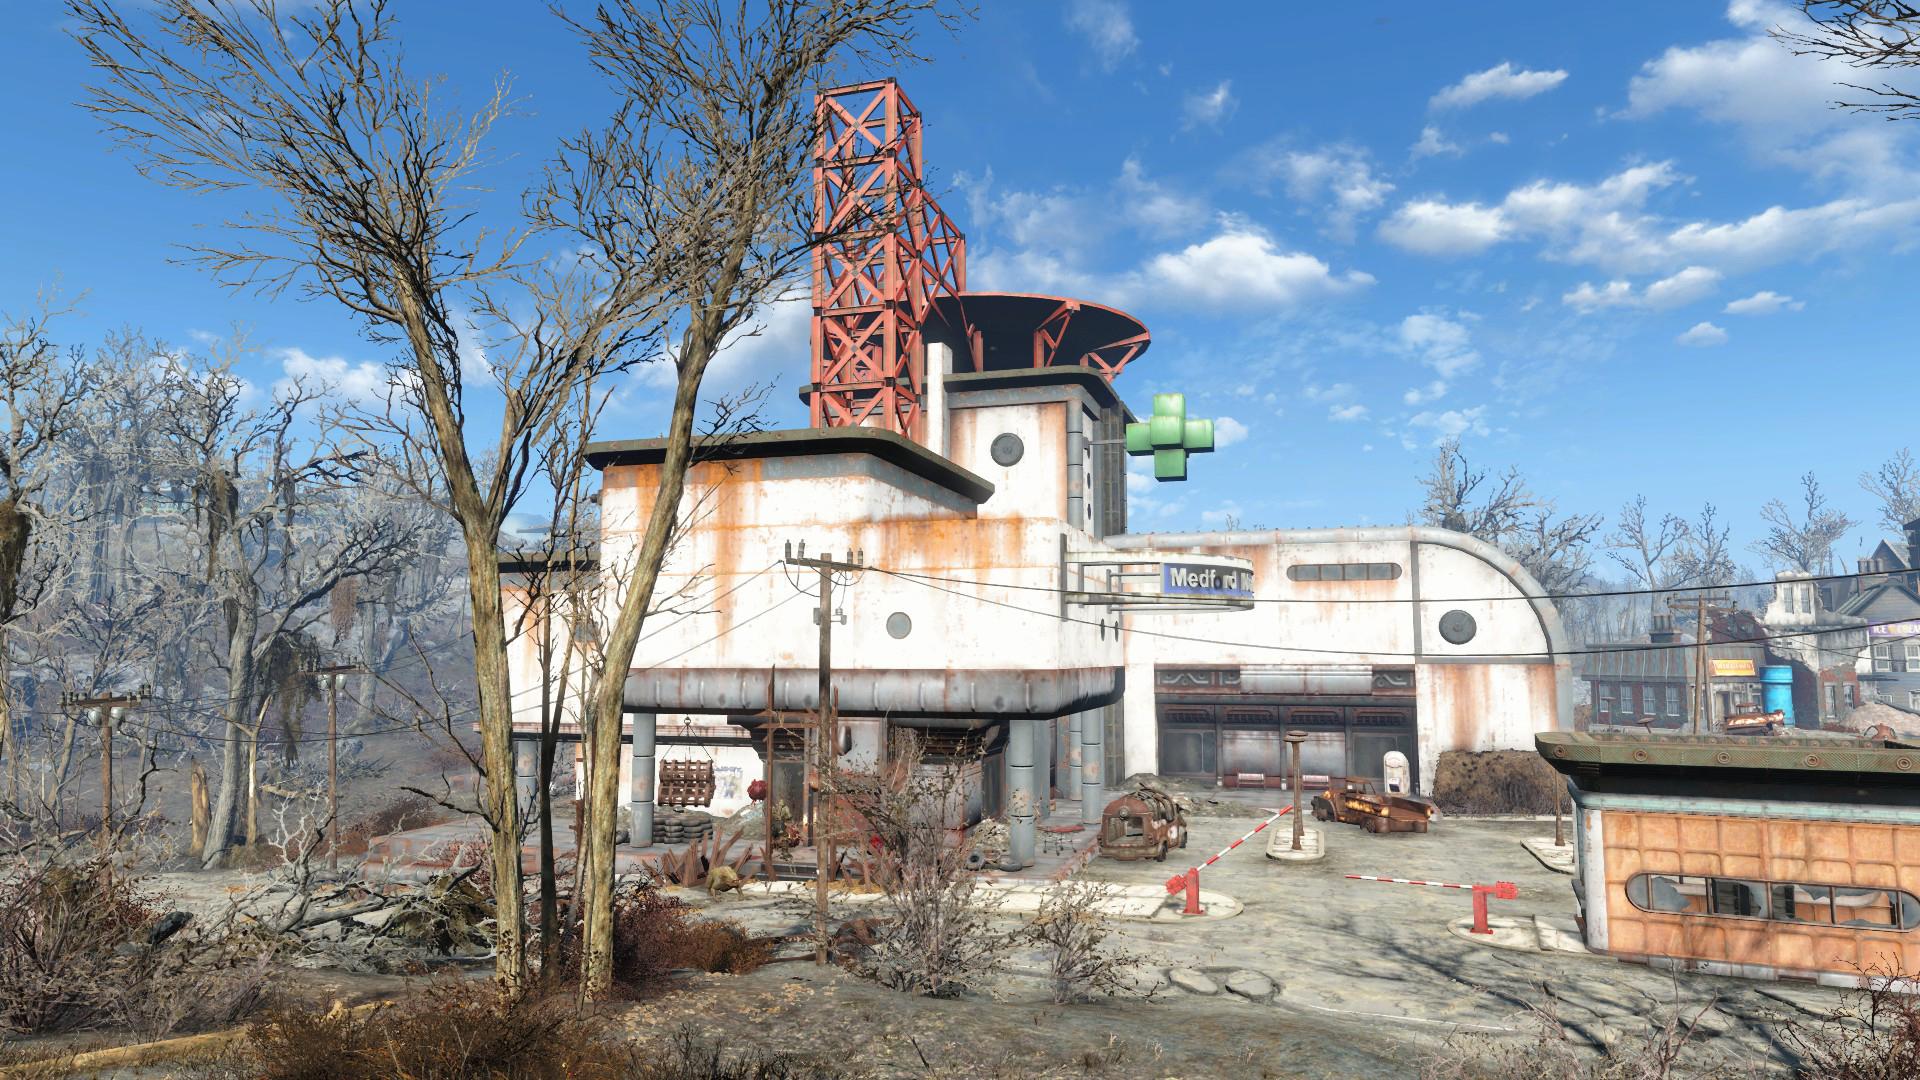 MedfordHospital-Fallout4.jpg